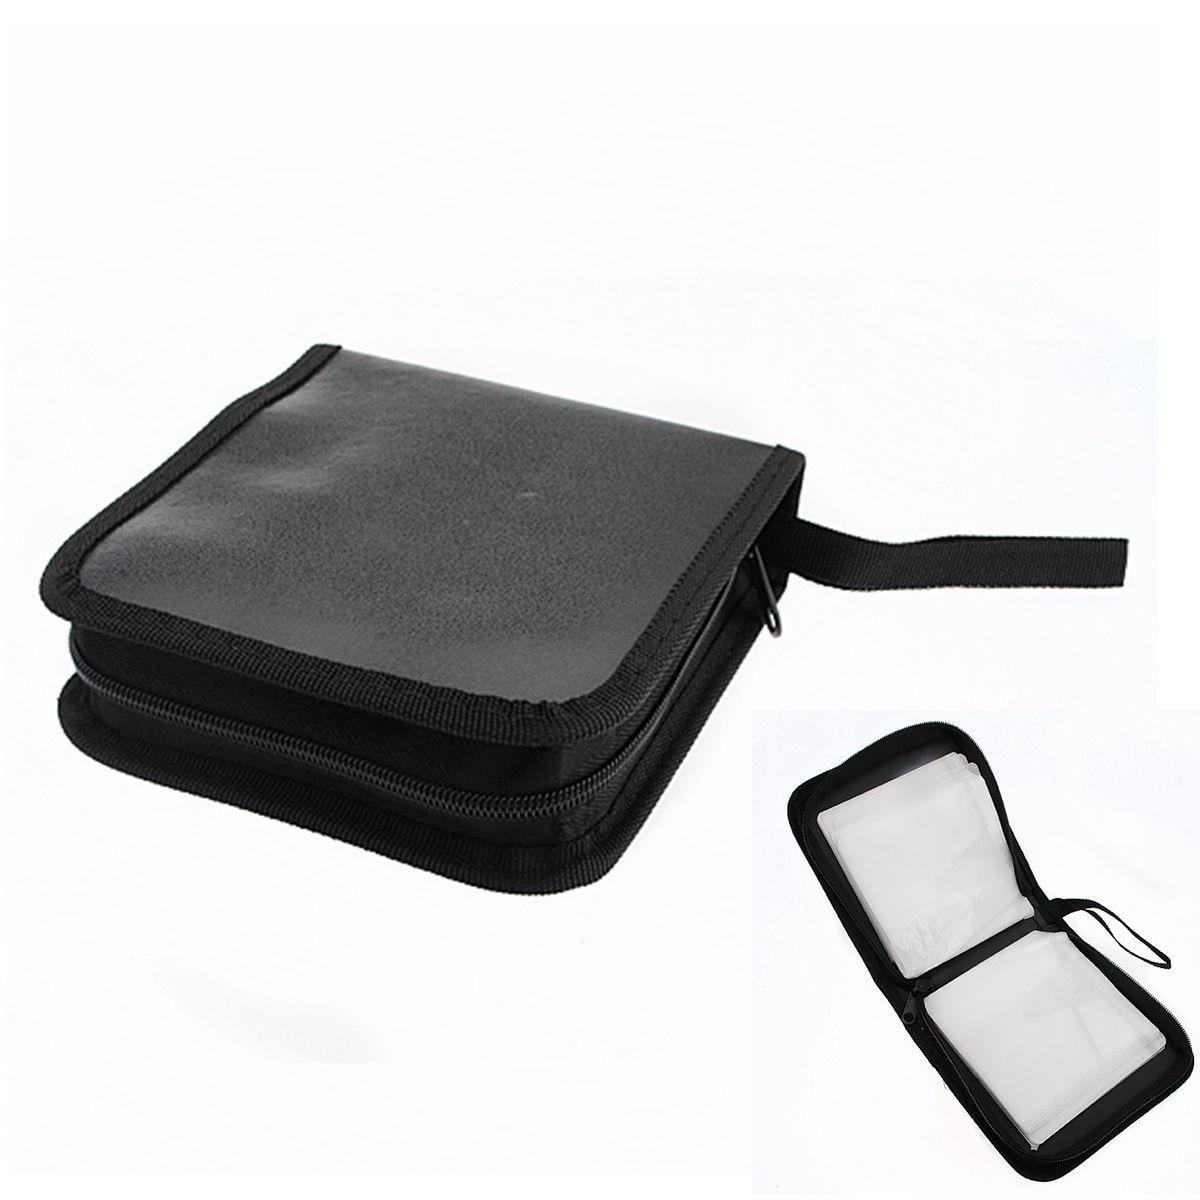 LEORY Black 40 Disc CD DVD Case Wallet Cover Bag Box Carry Case Storage  Holder Organizer Sleeve CD DVD Holder DJ Storage Cover In CD Bags U0026 Cases  From ...